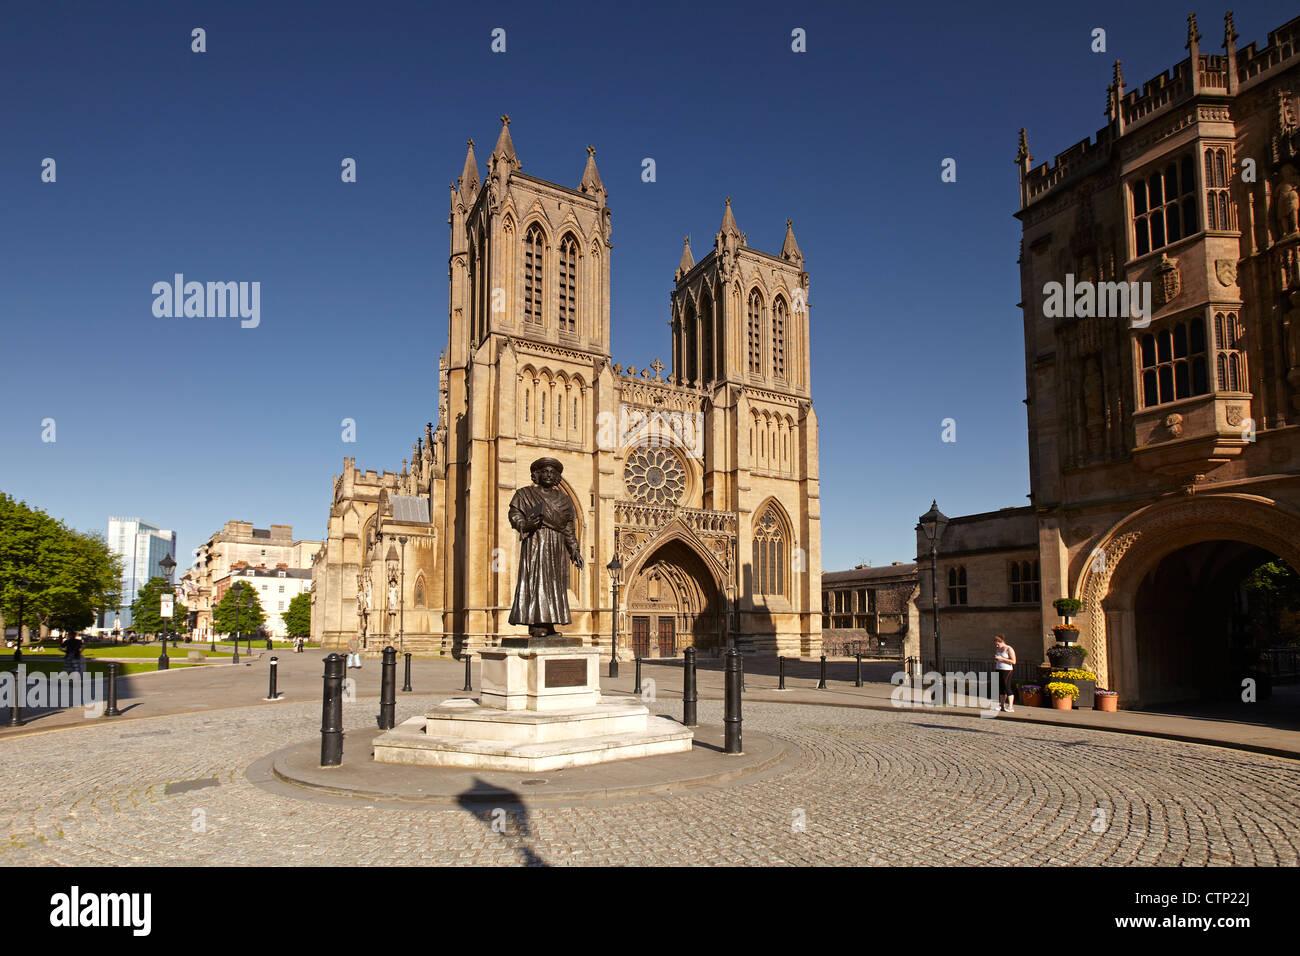 Bristol Cathedral, Bristol, England, UK - Stock Image